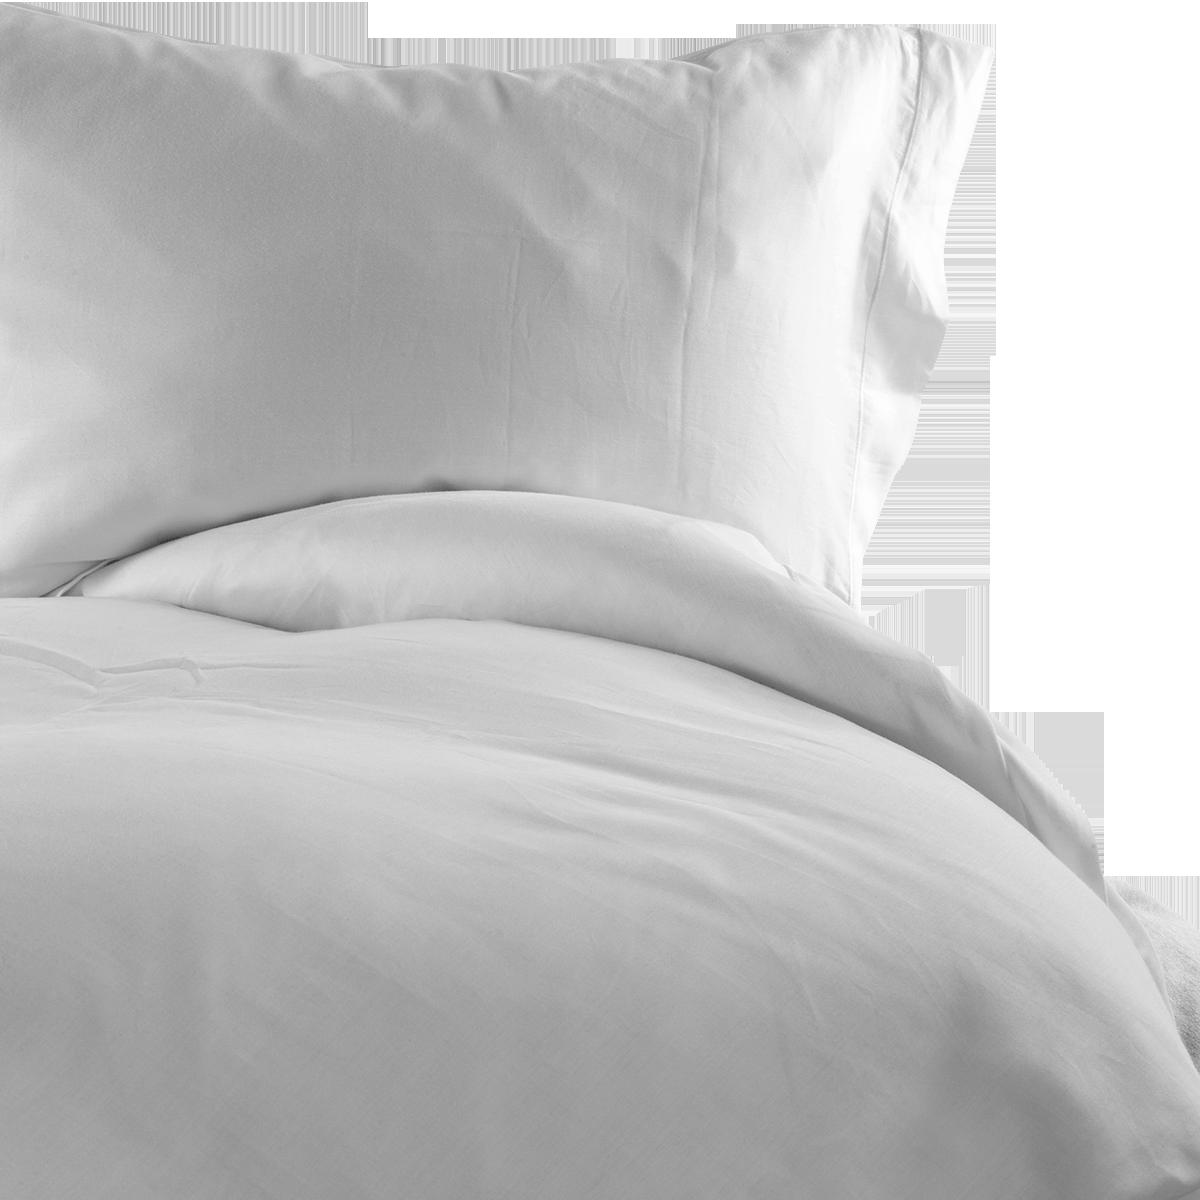 White 300 TC Easycare Cotton With Tencel Superking Duvet cover